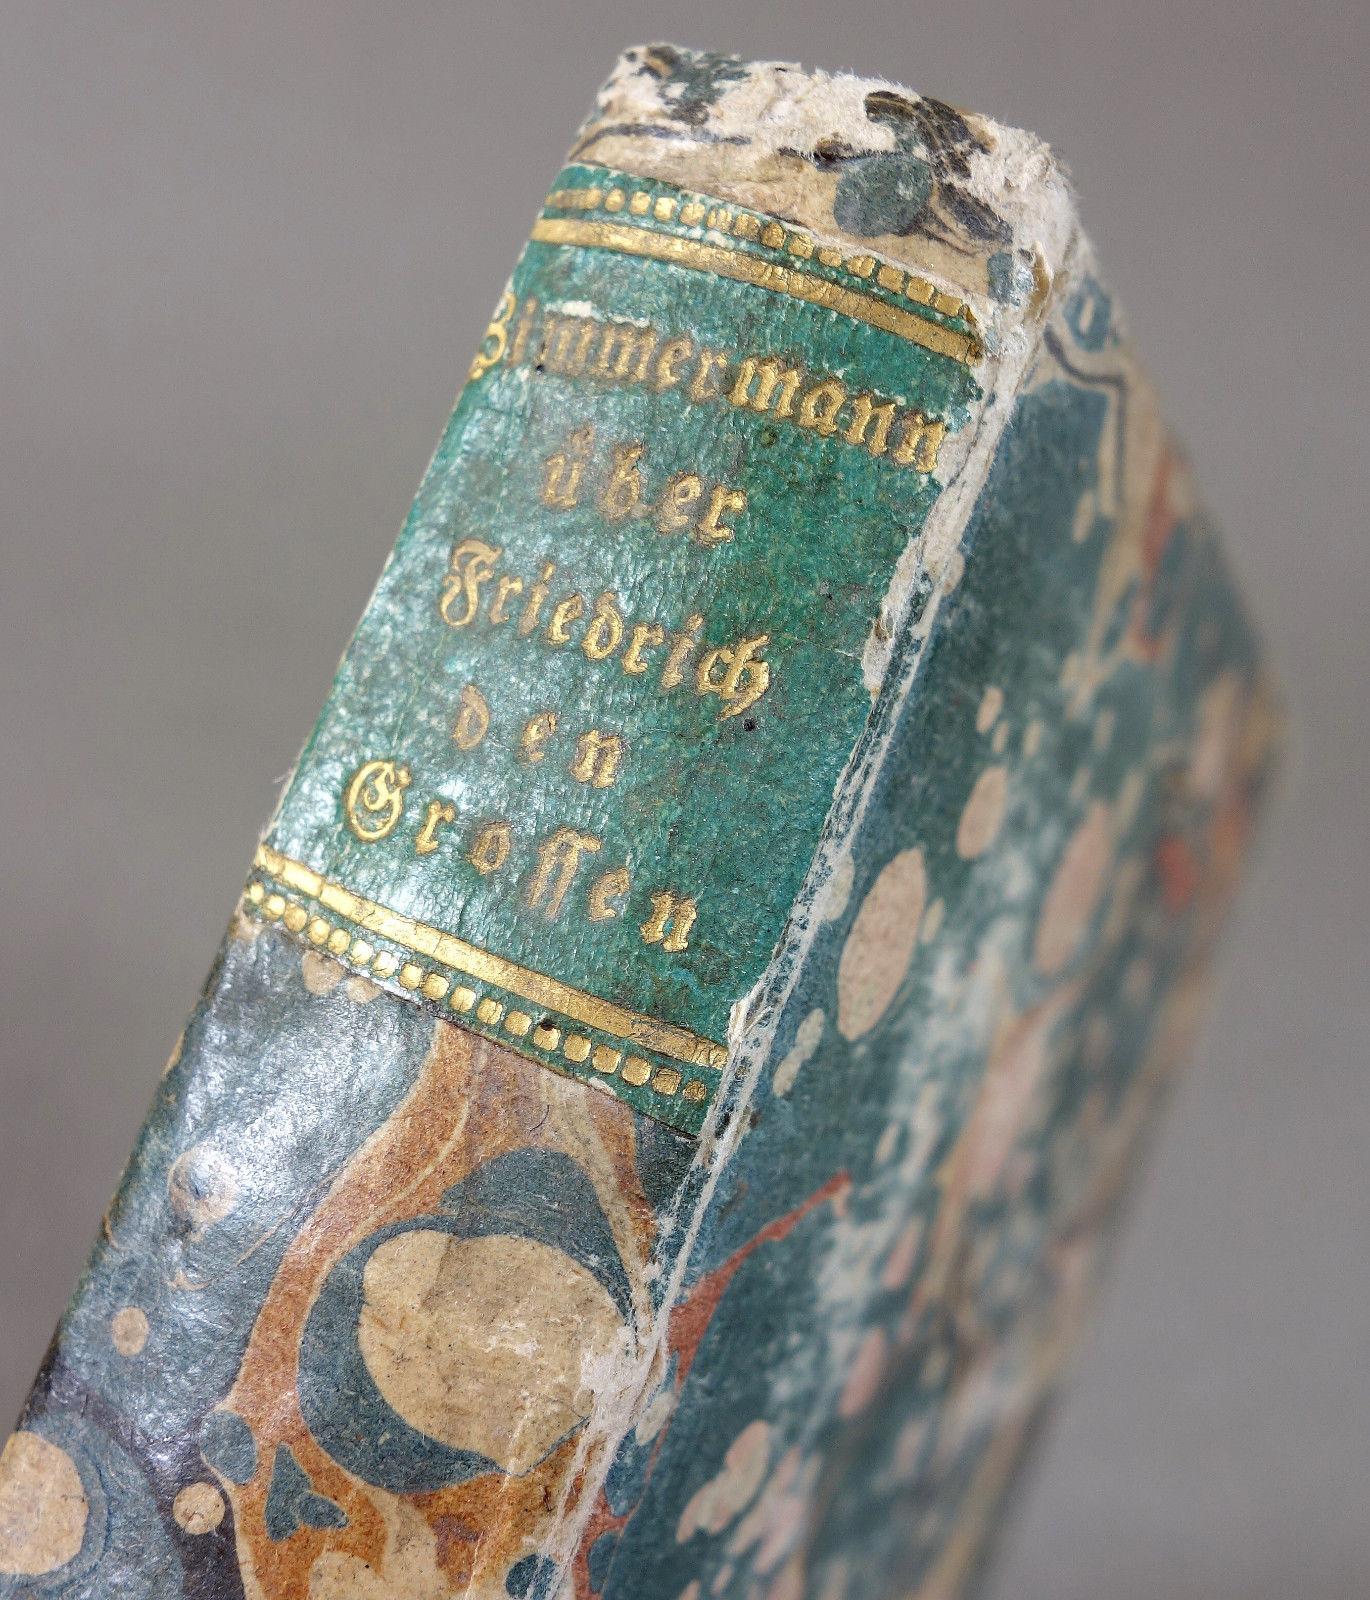 1788 - PREUSSEN - Friedrich der Große - LEIBARZT Potsdam Adel Medizin - SELTEN